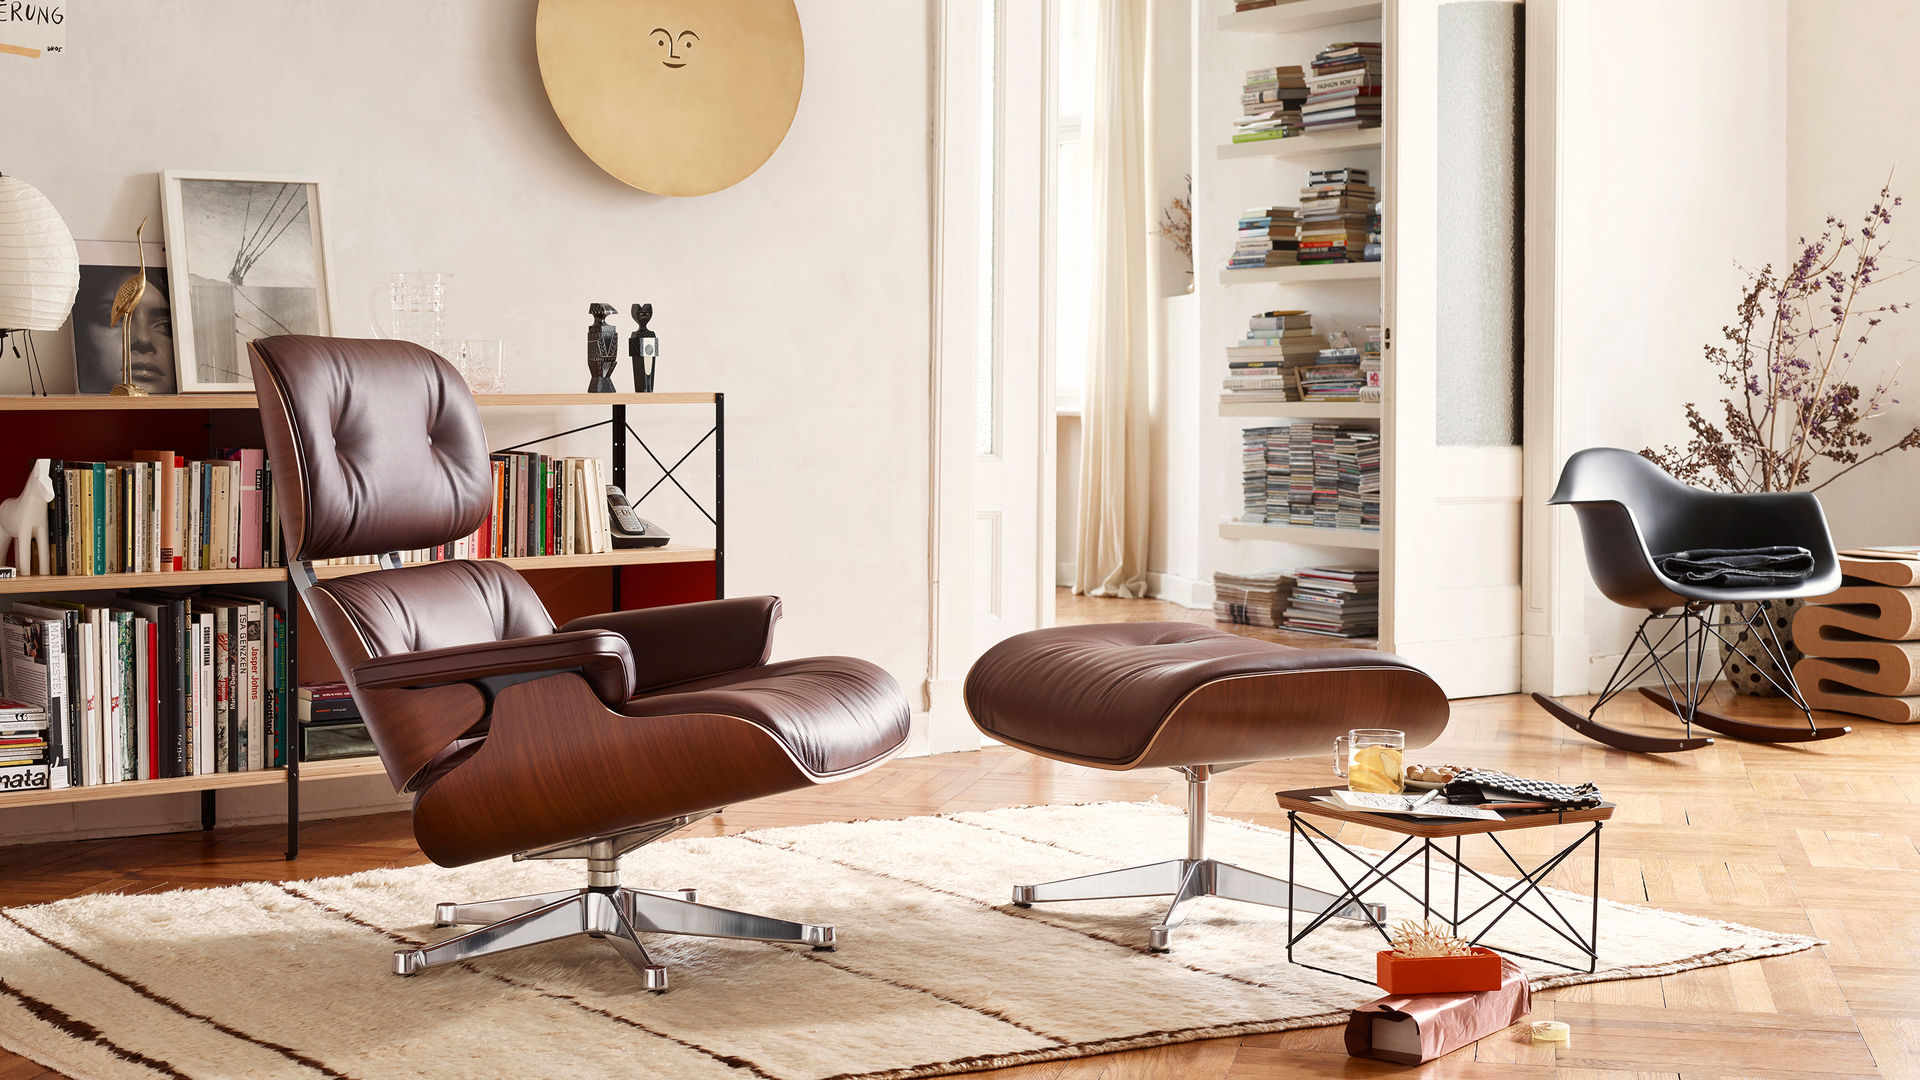 Lounge Chair Ottoman Occasional Table LTR Eames Plastic Armchair RAR Metal  Wall Relief Sun Wiggle Stool